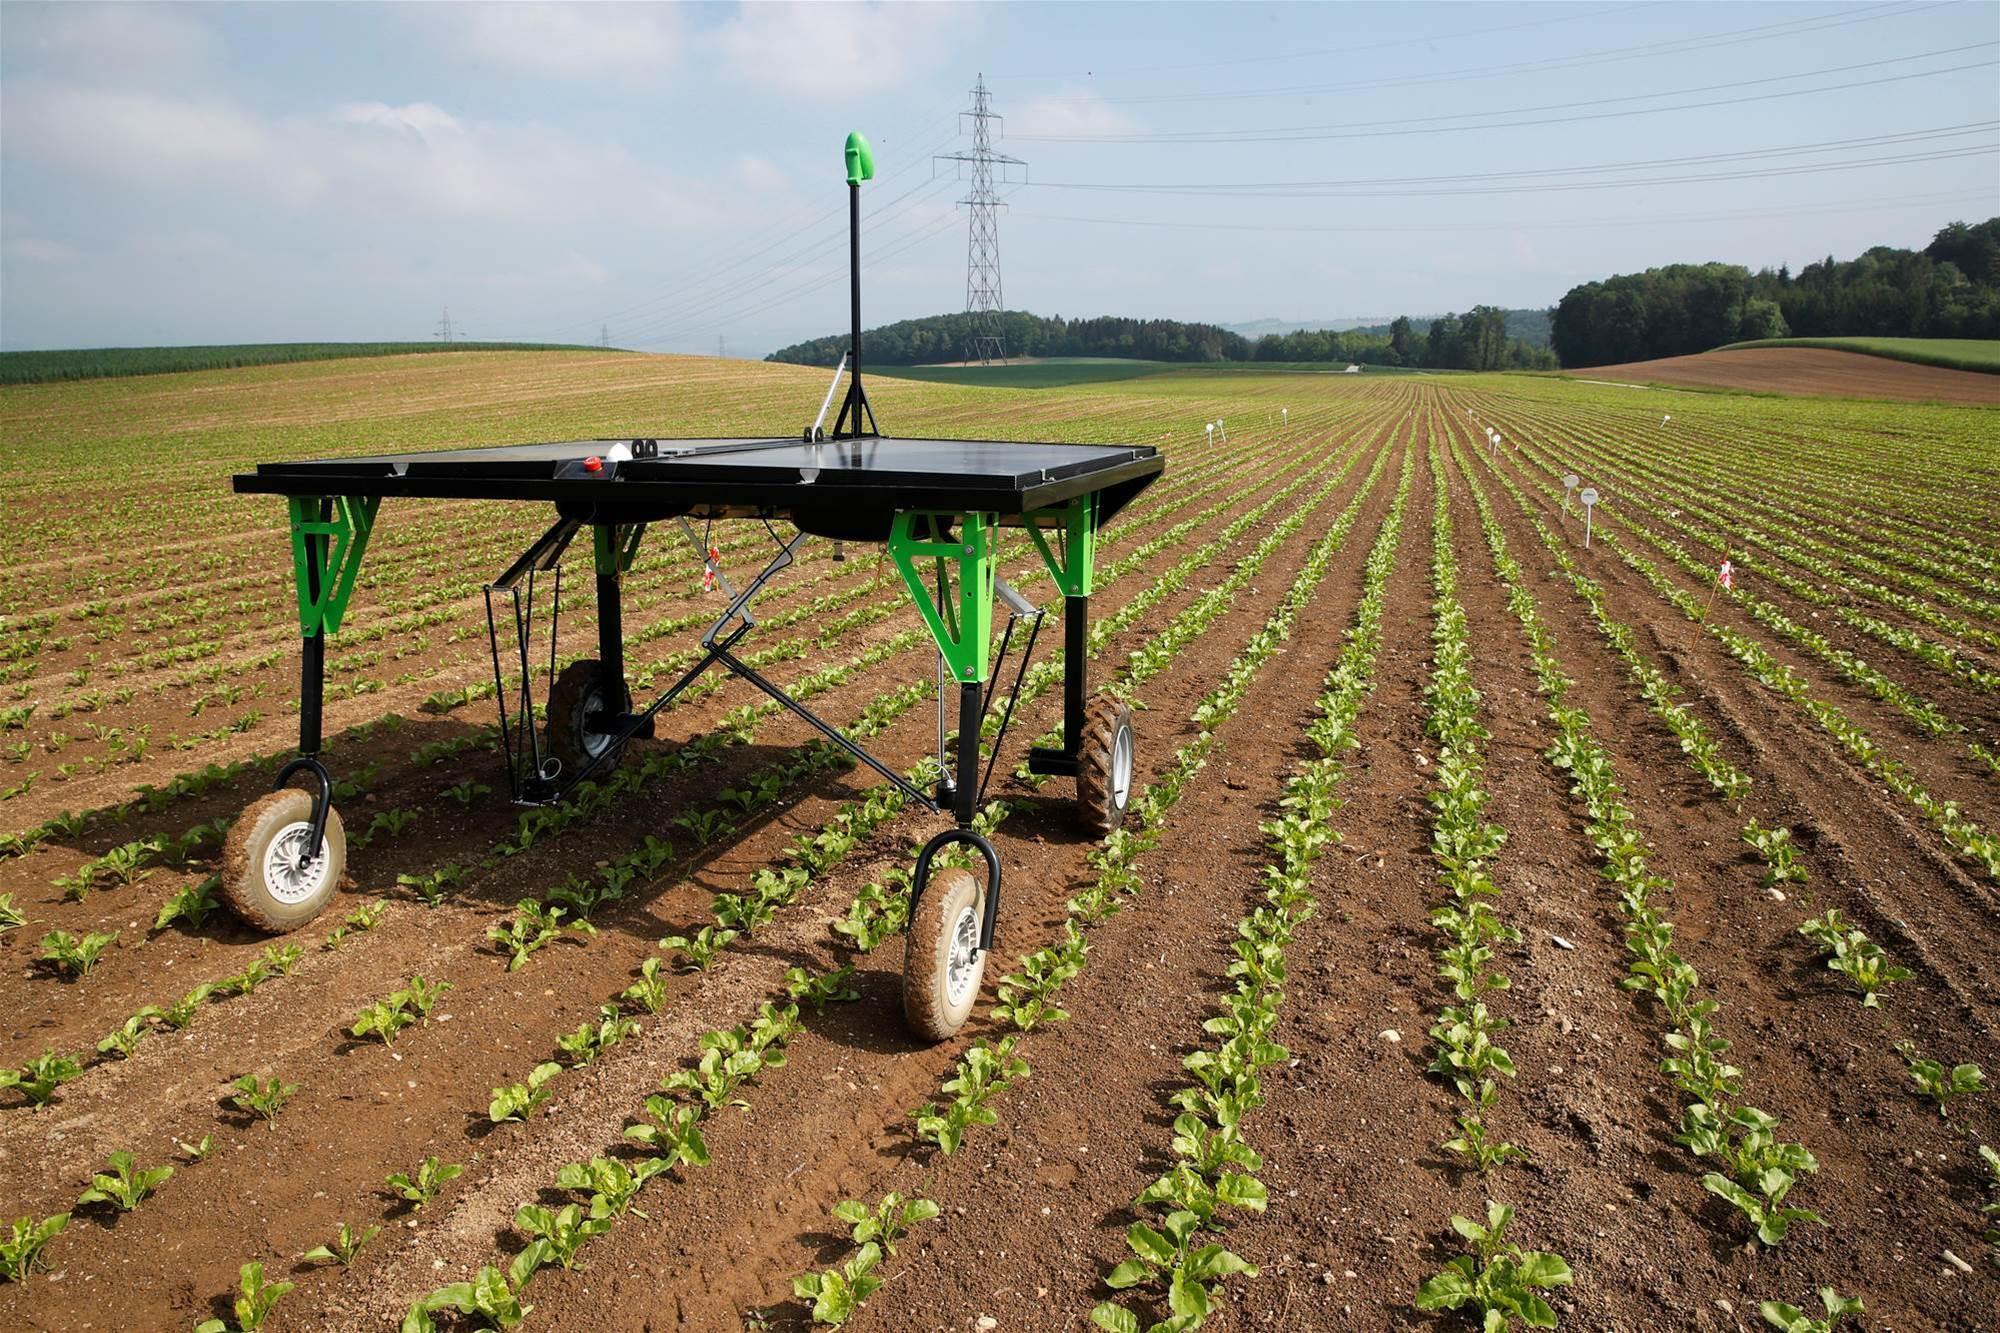 Robotic weed killers challenge fertiliser industry